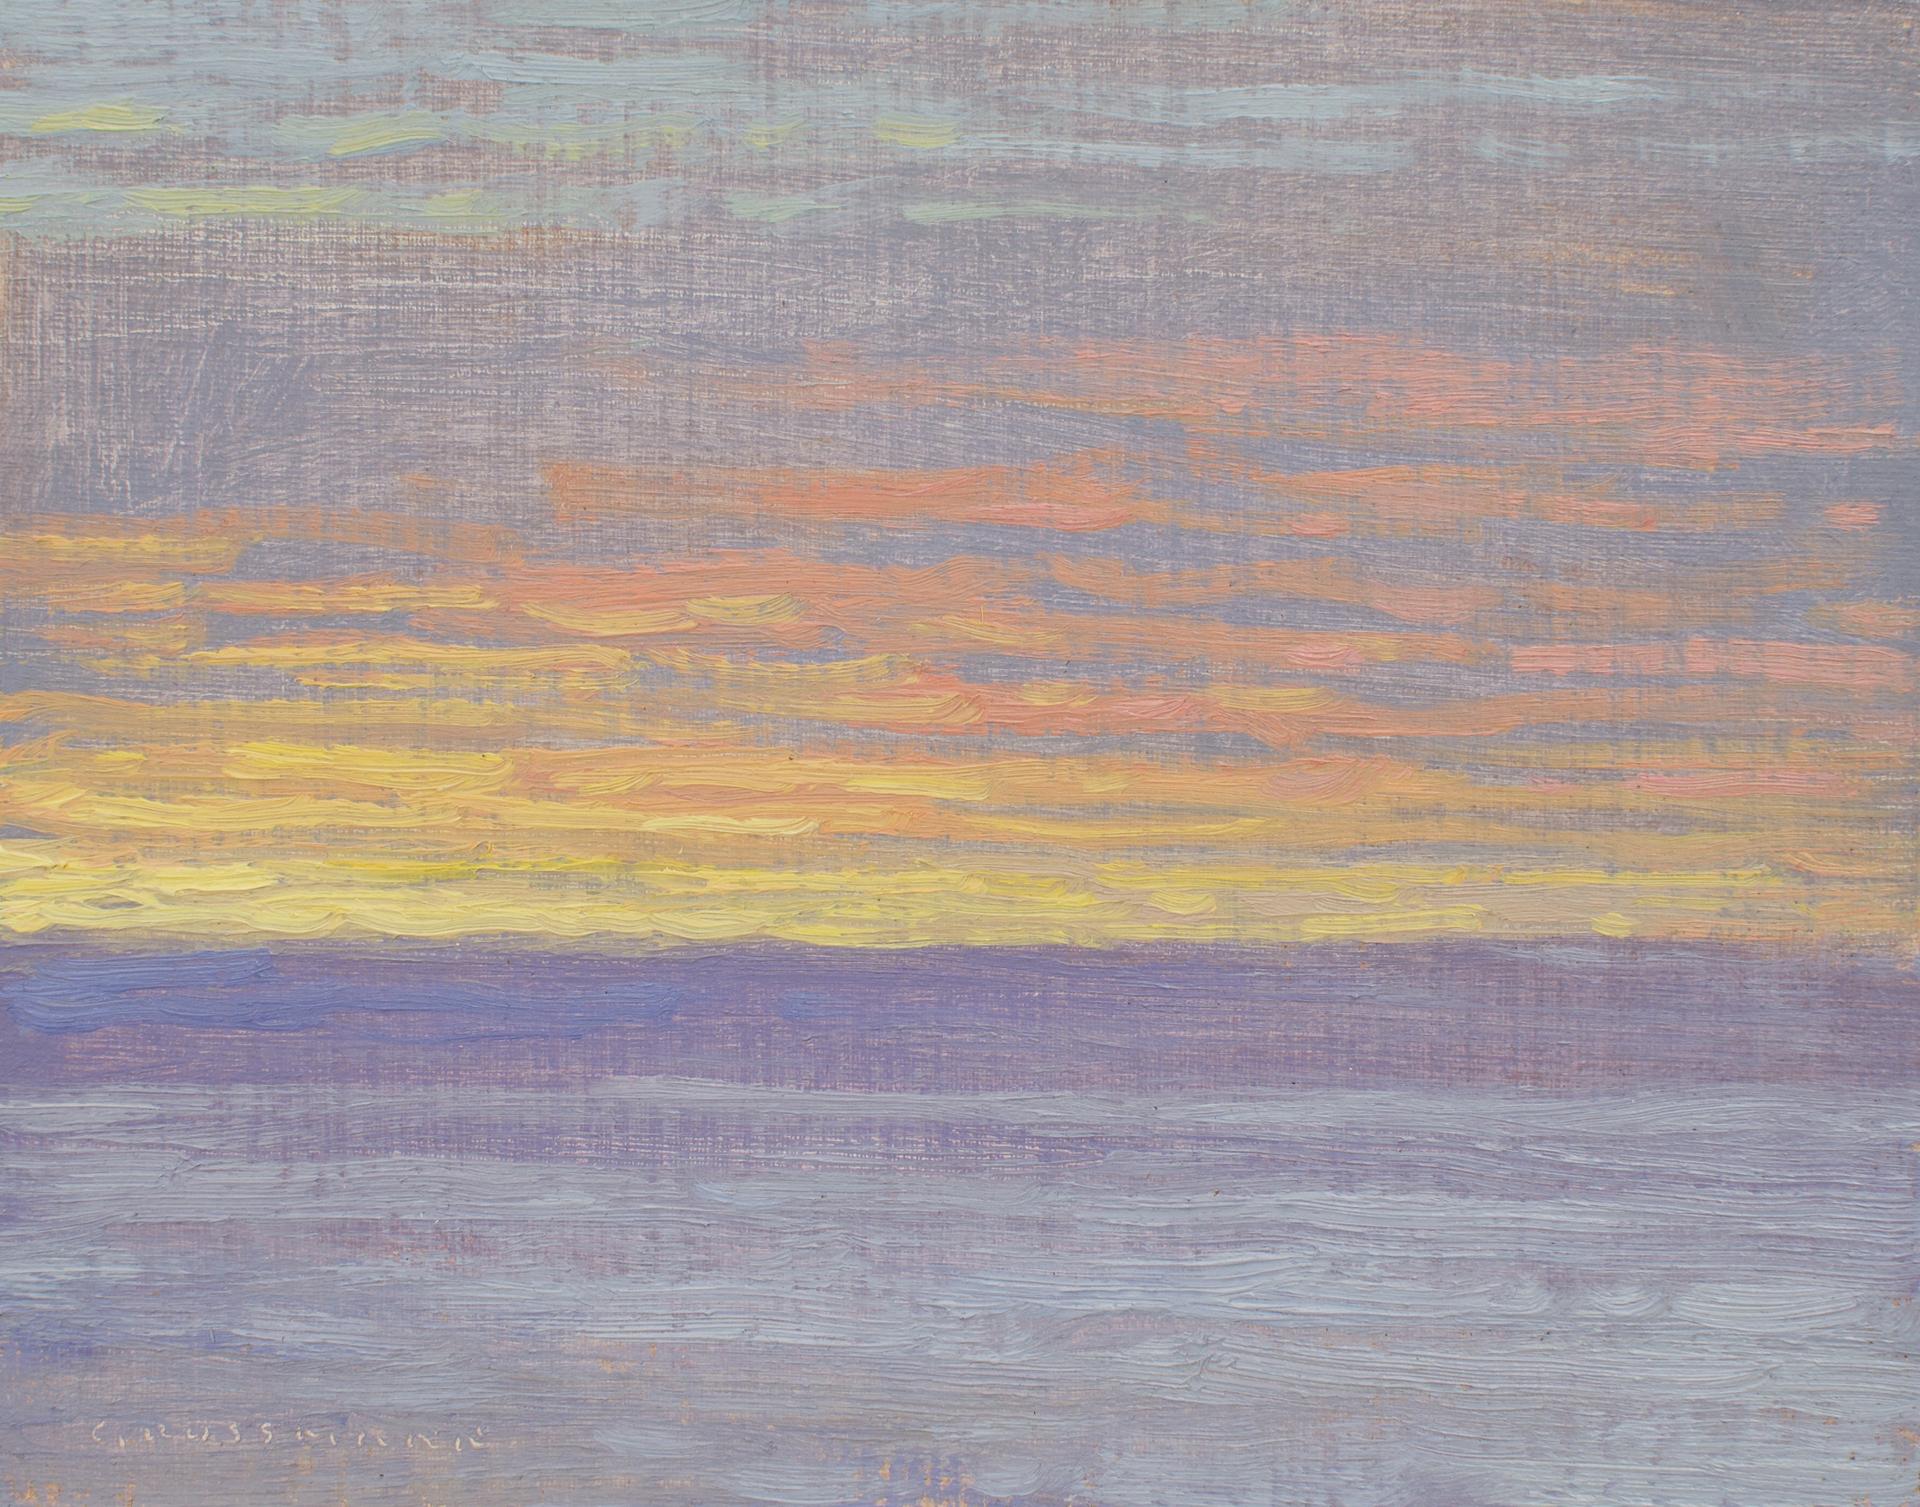 February 4th Sunrise by David Grossmann